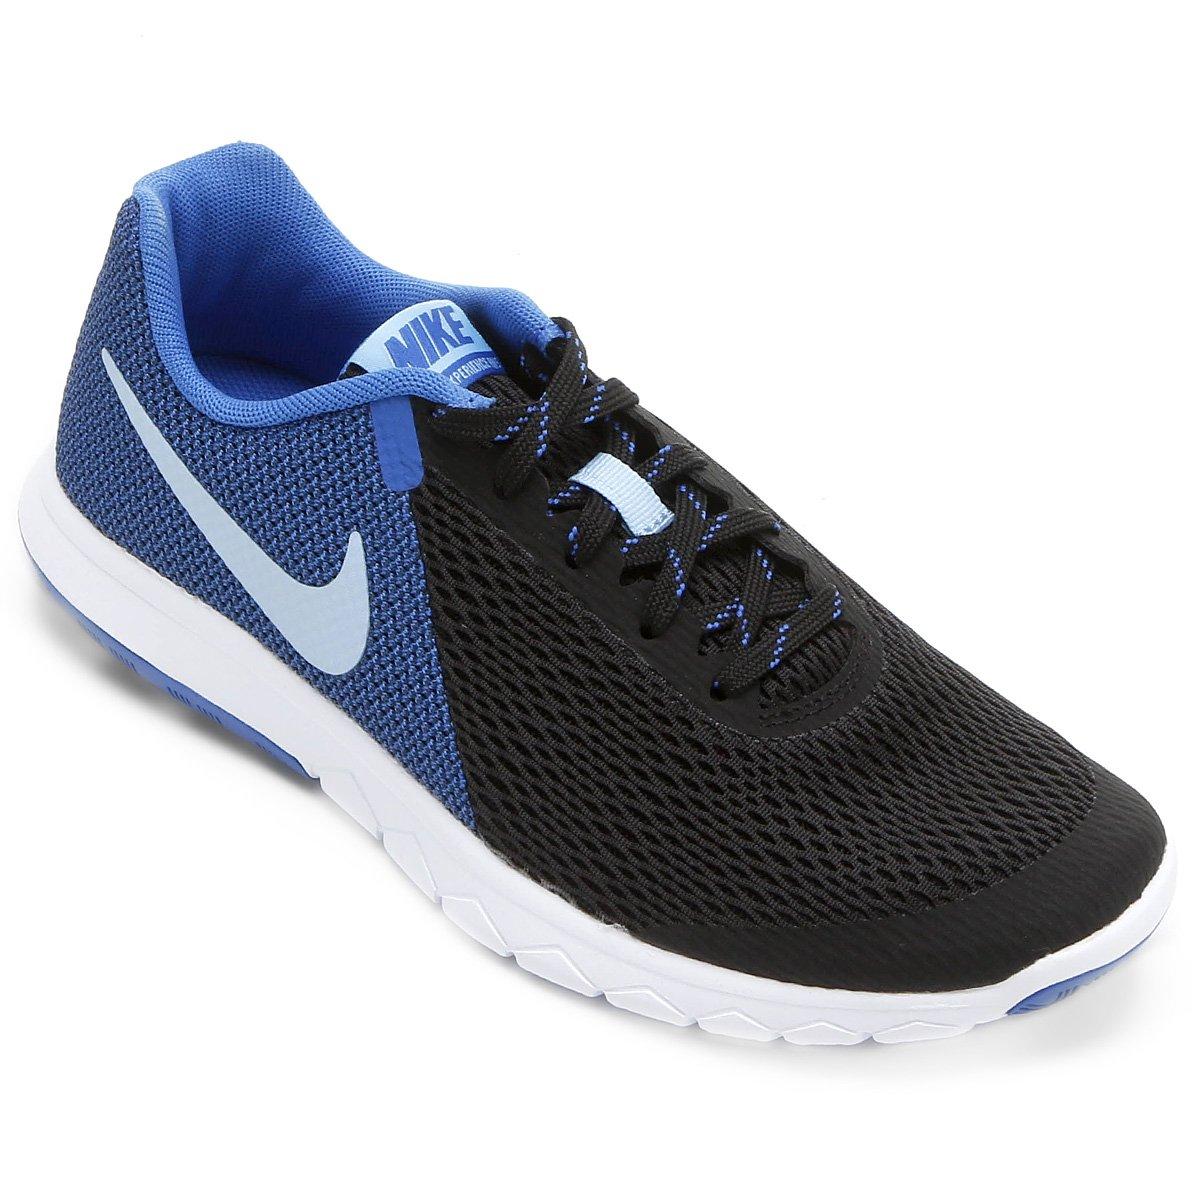 a6429f2fddd Tênis Nike Flex Experience Rn 5 Feminino - Compre Agora